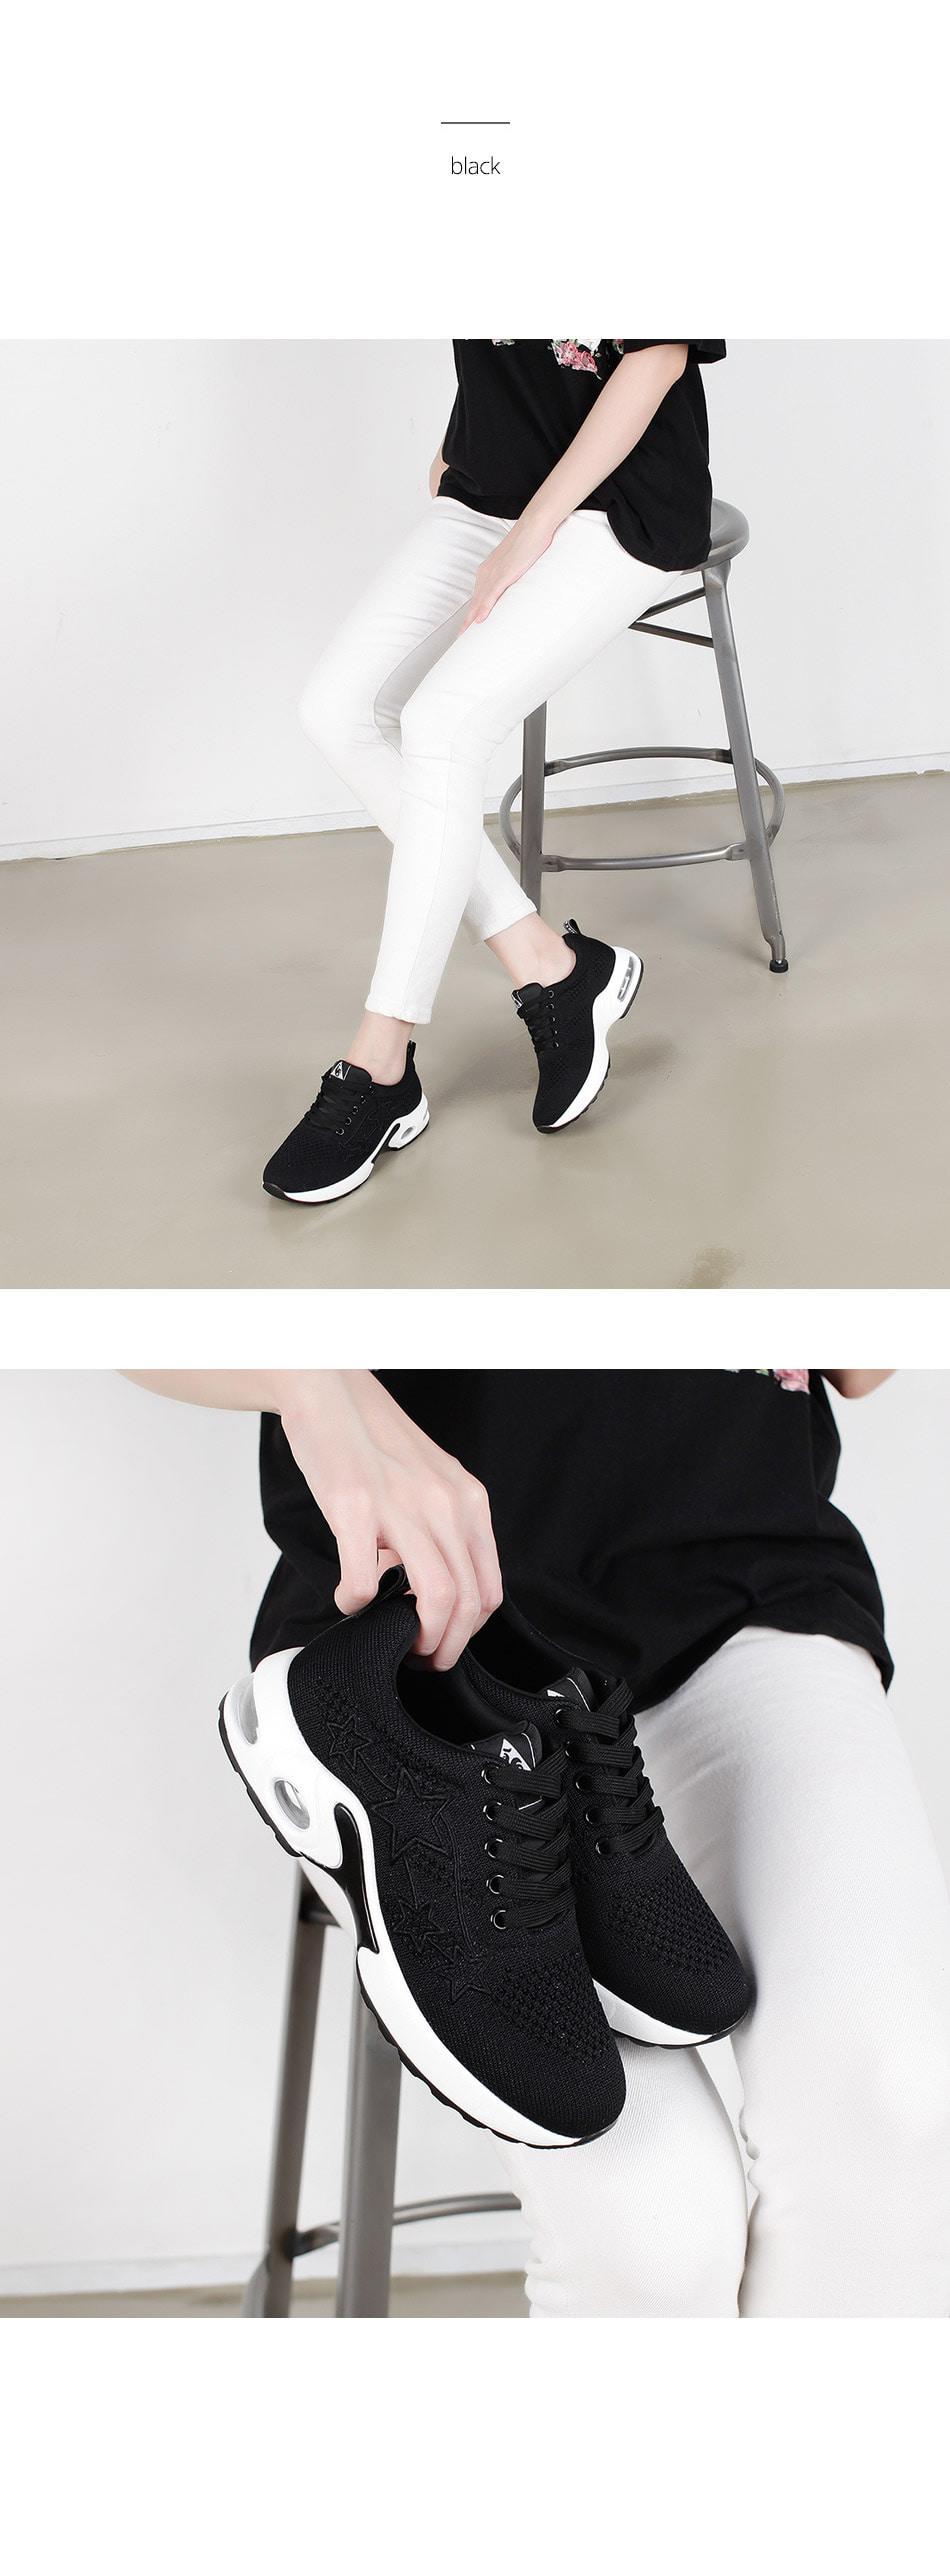 WS-6903 여자 캐주얼 운동화 스니커즈 블랙 레드 - 더보이더걸, 44,800원, 운동화/슬립온, 운동화